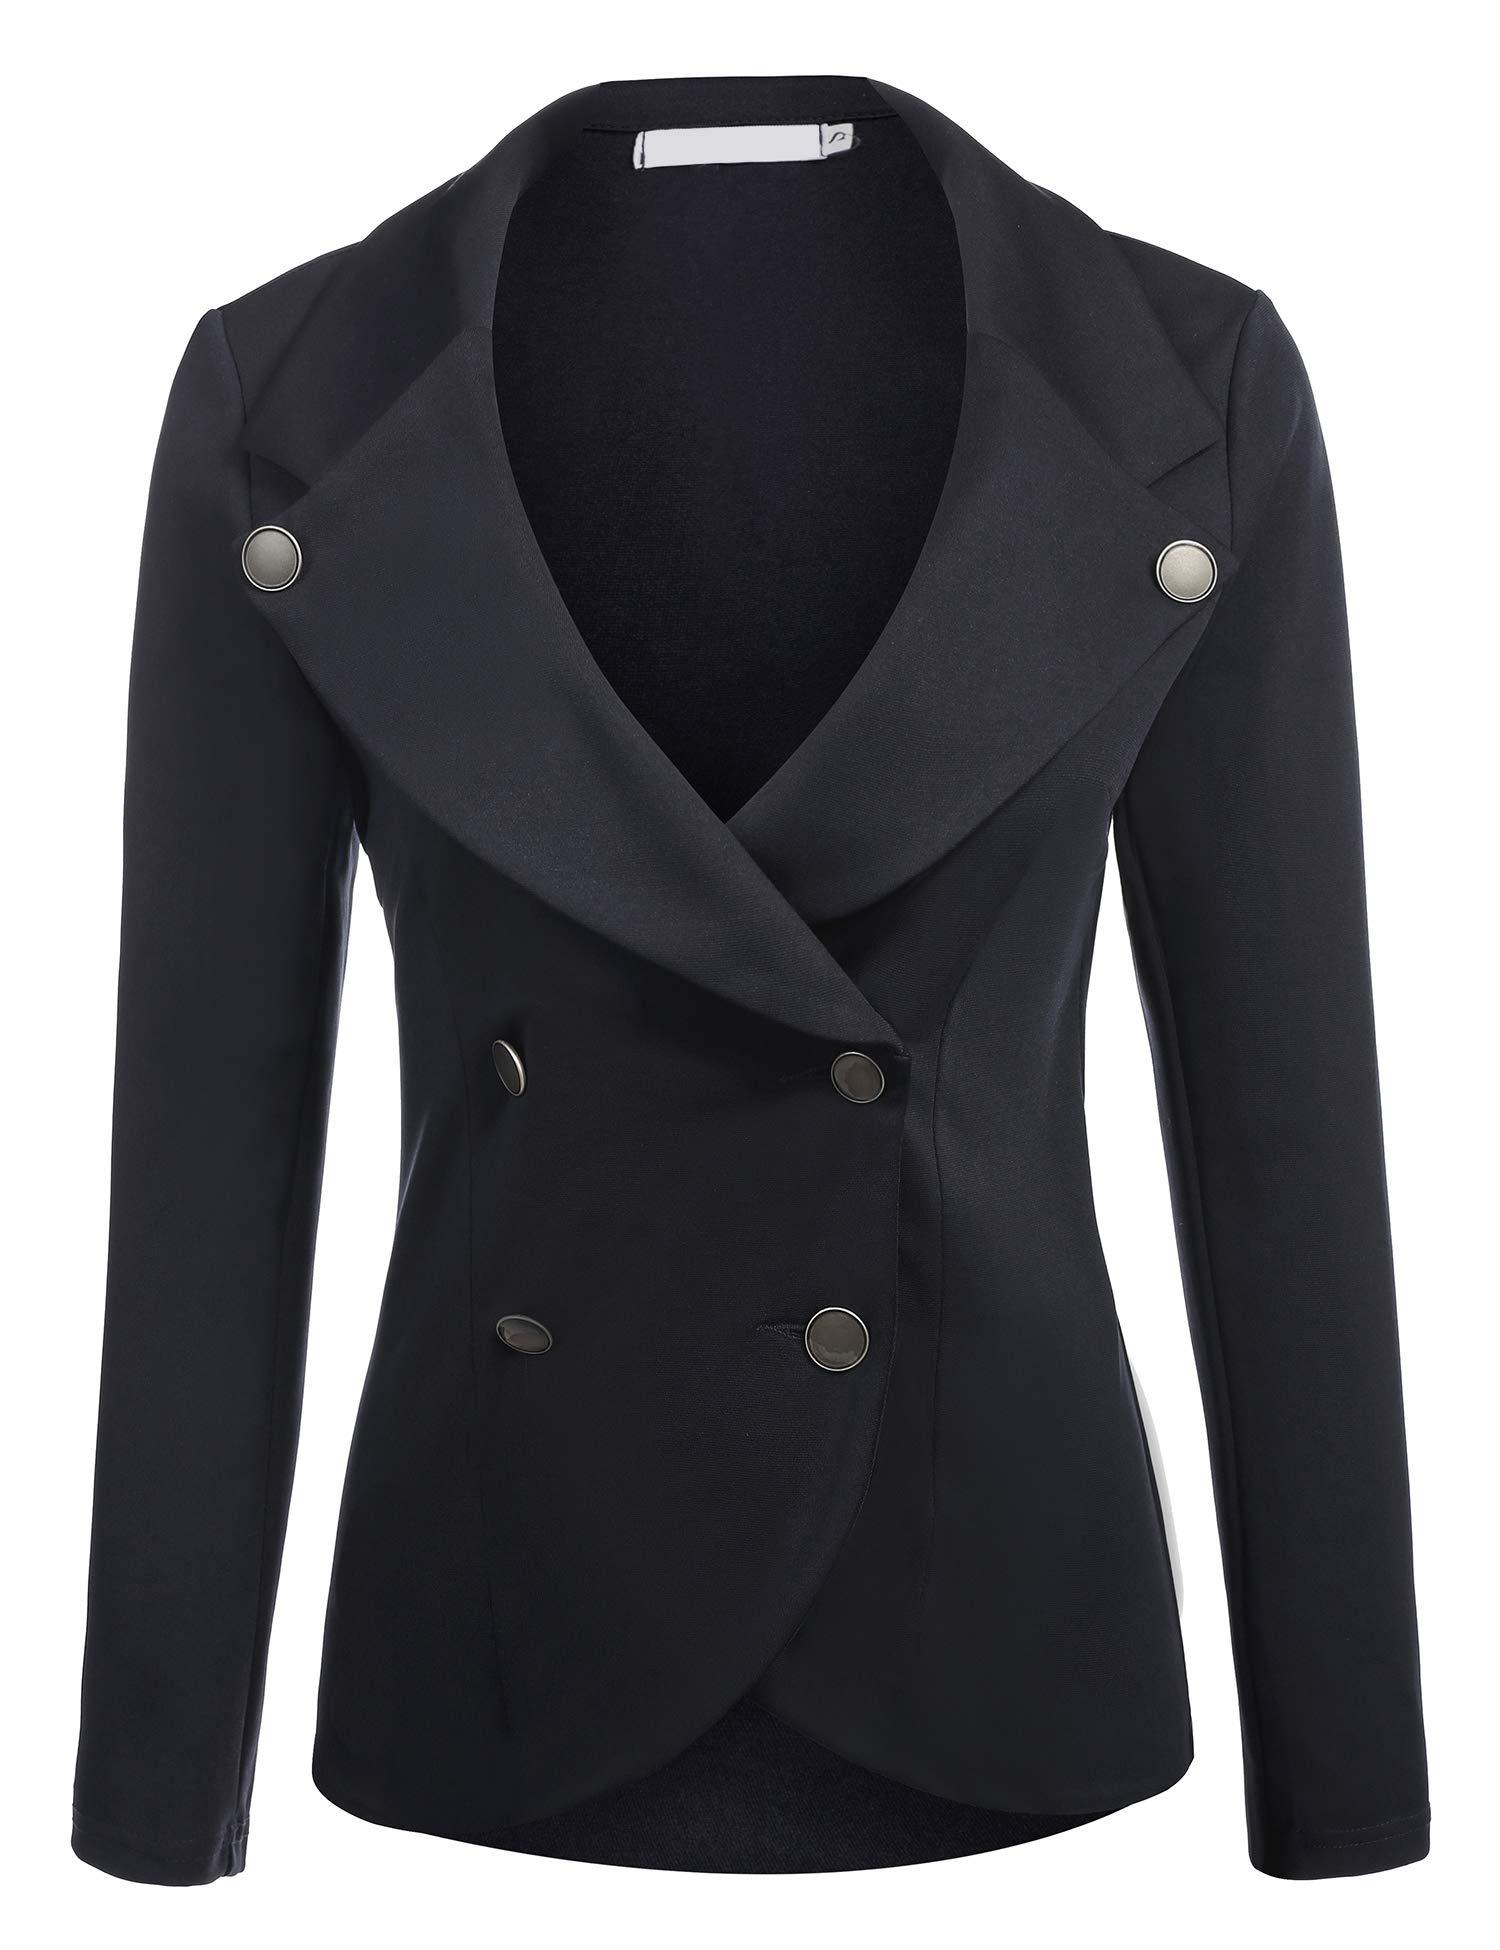 ELESOL Women's Slim Fit Blazer Casual Work Double Breasted Peplum Crop Jacket (Small, Black)